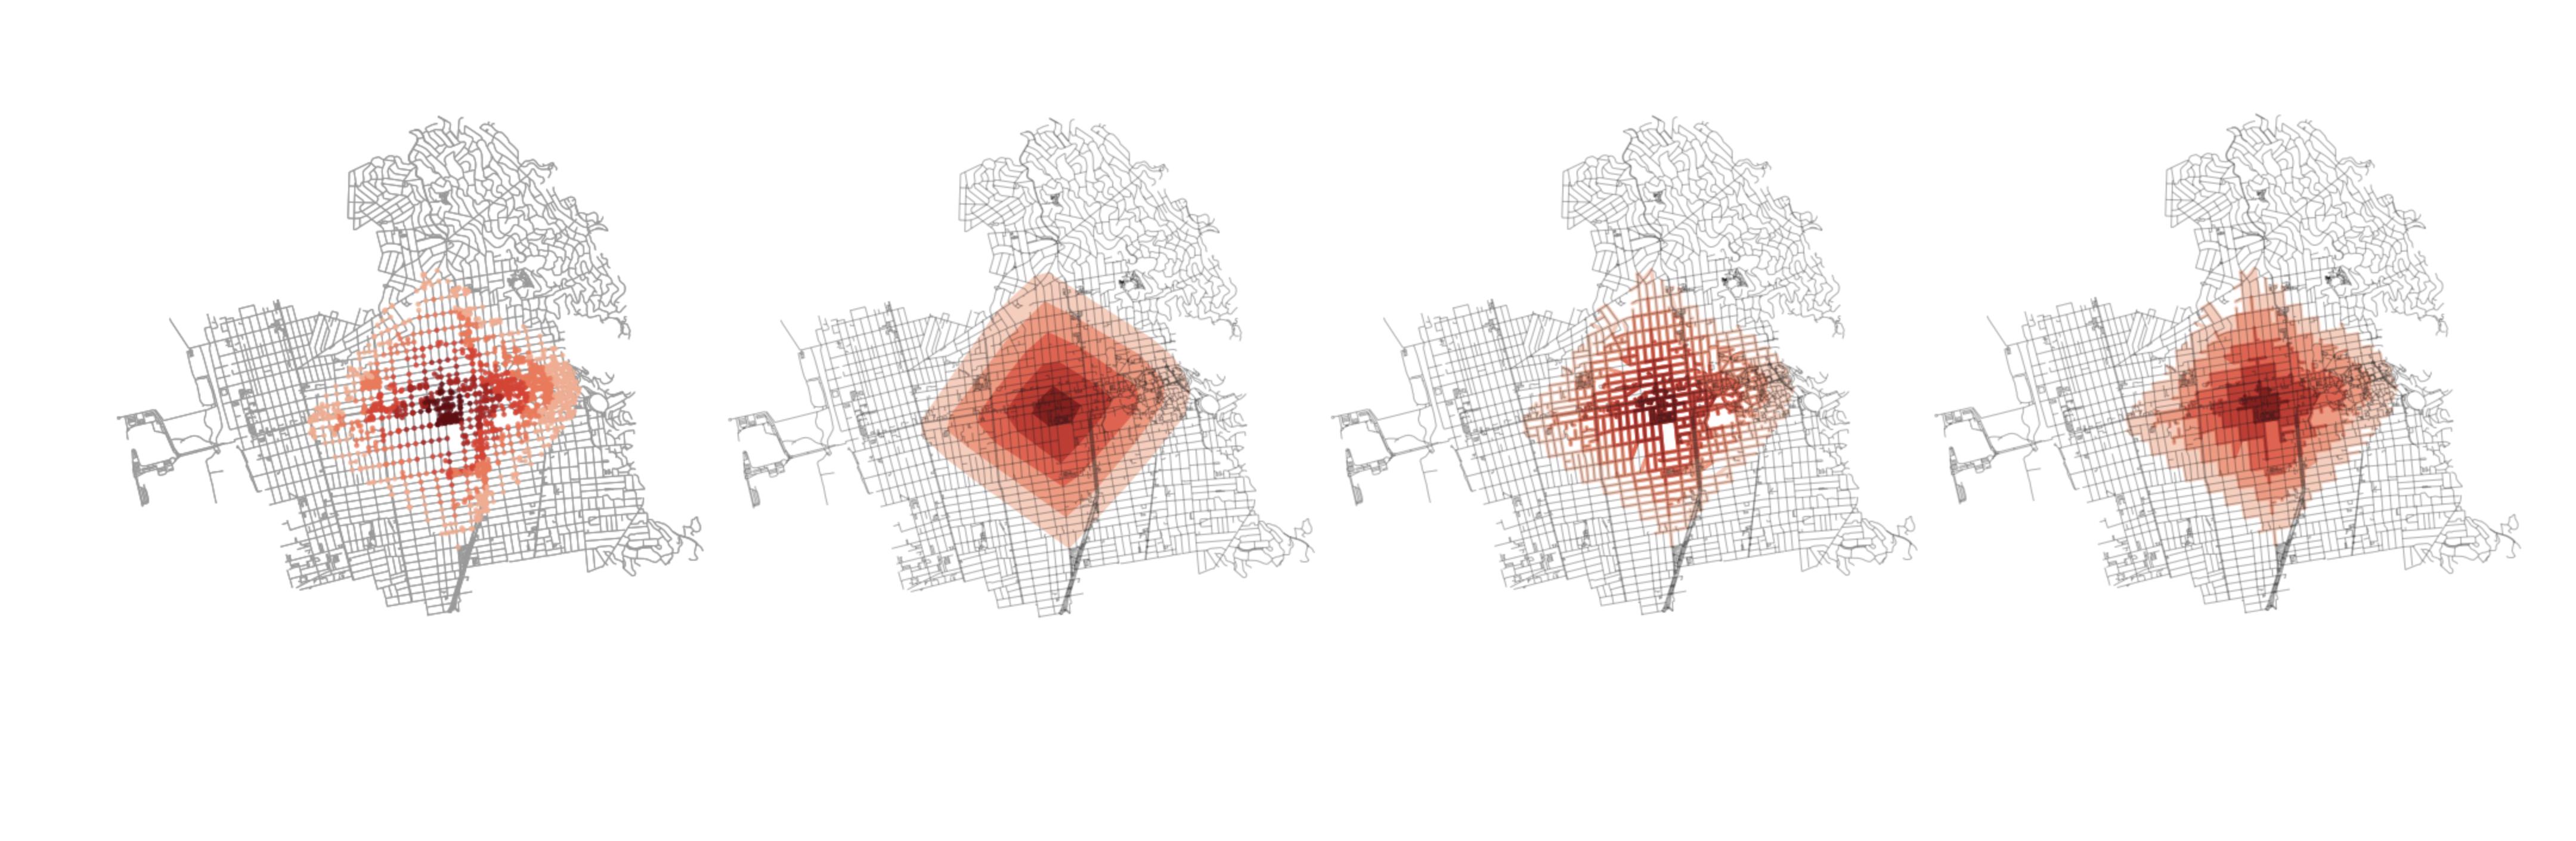 Better Rendering of Isochrones from Network Graphs – kuan butts